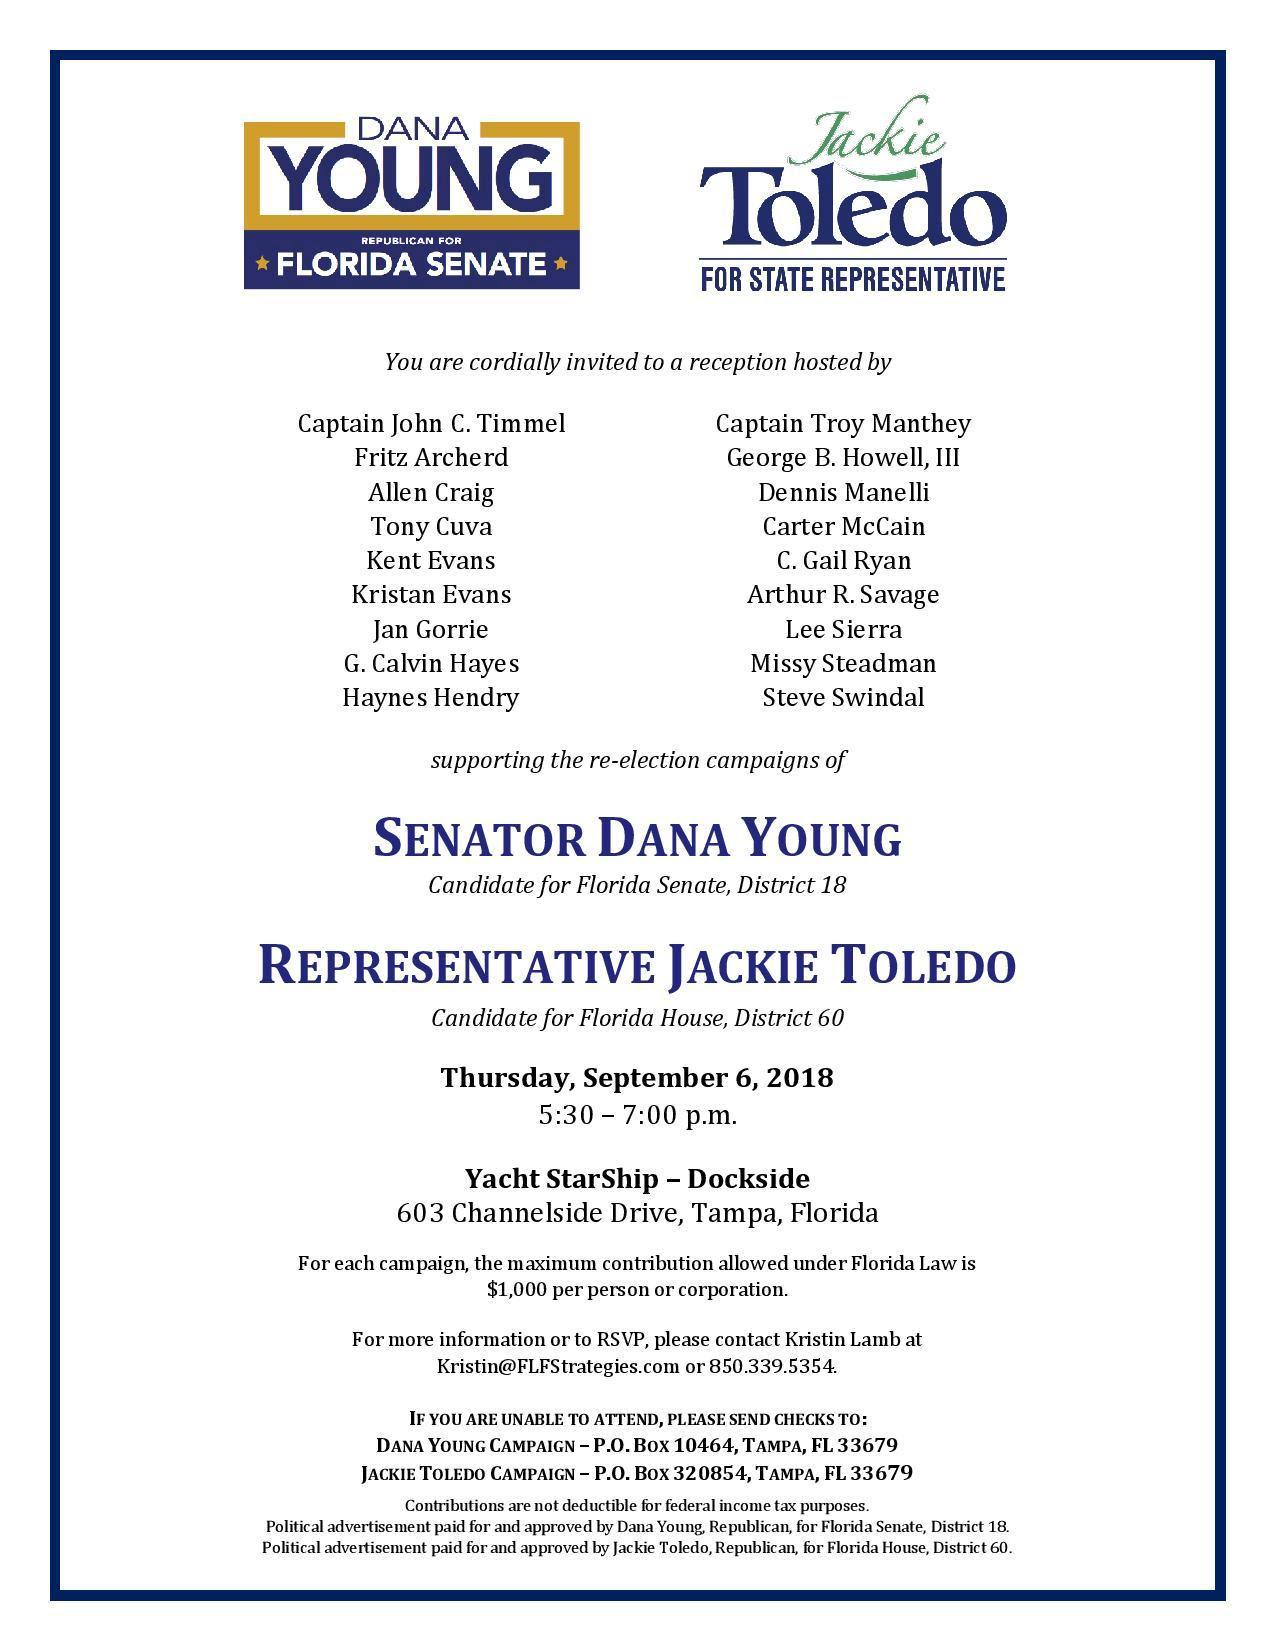 Dana Young & Jackie Toledo fundraiser 9.6.2018